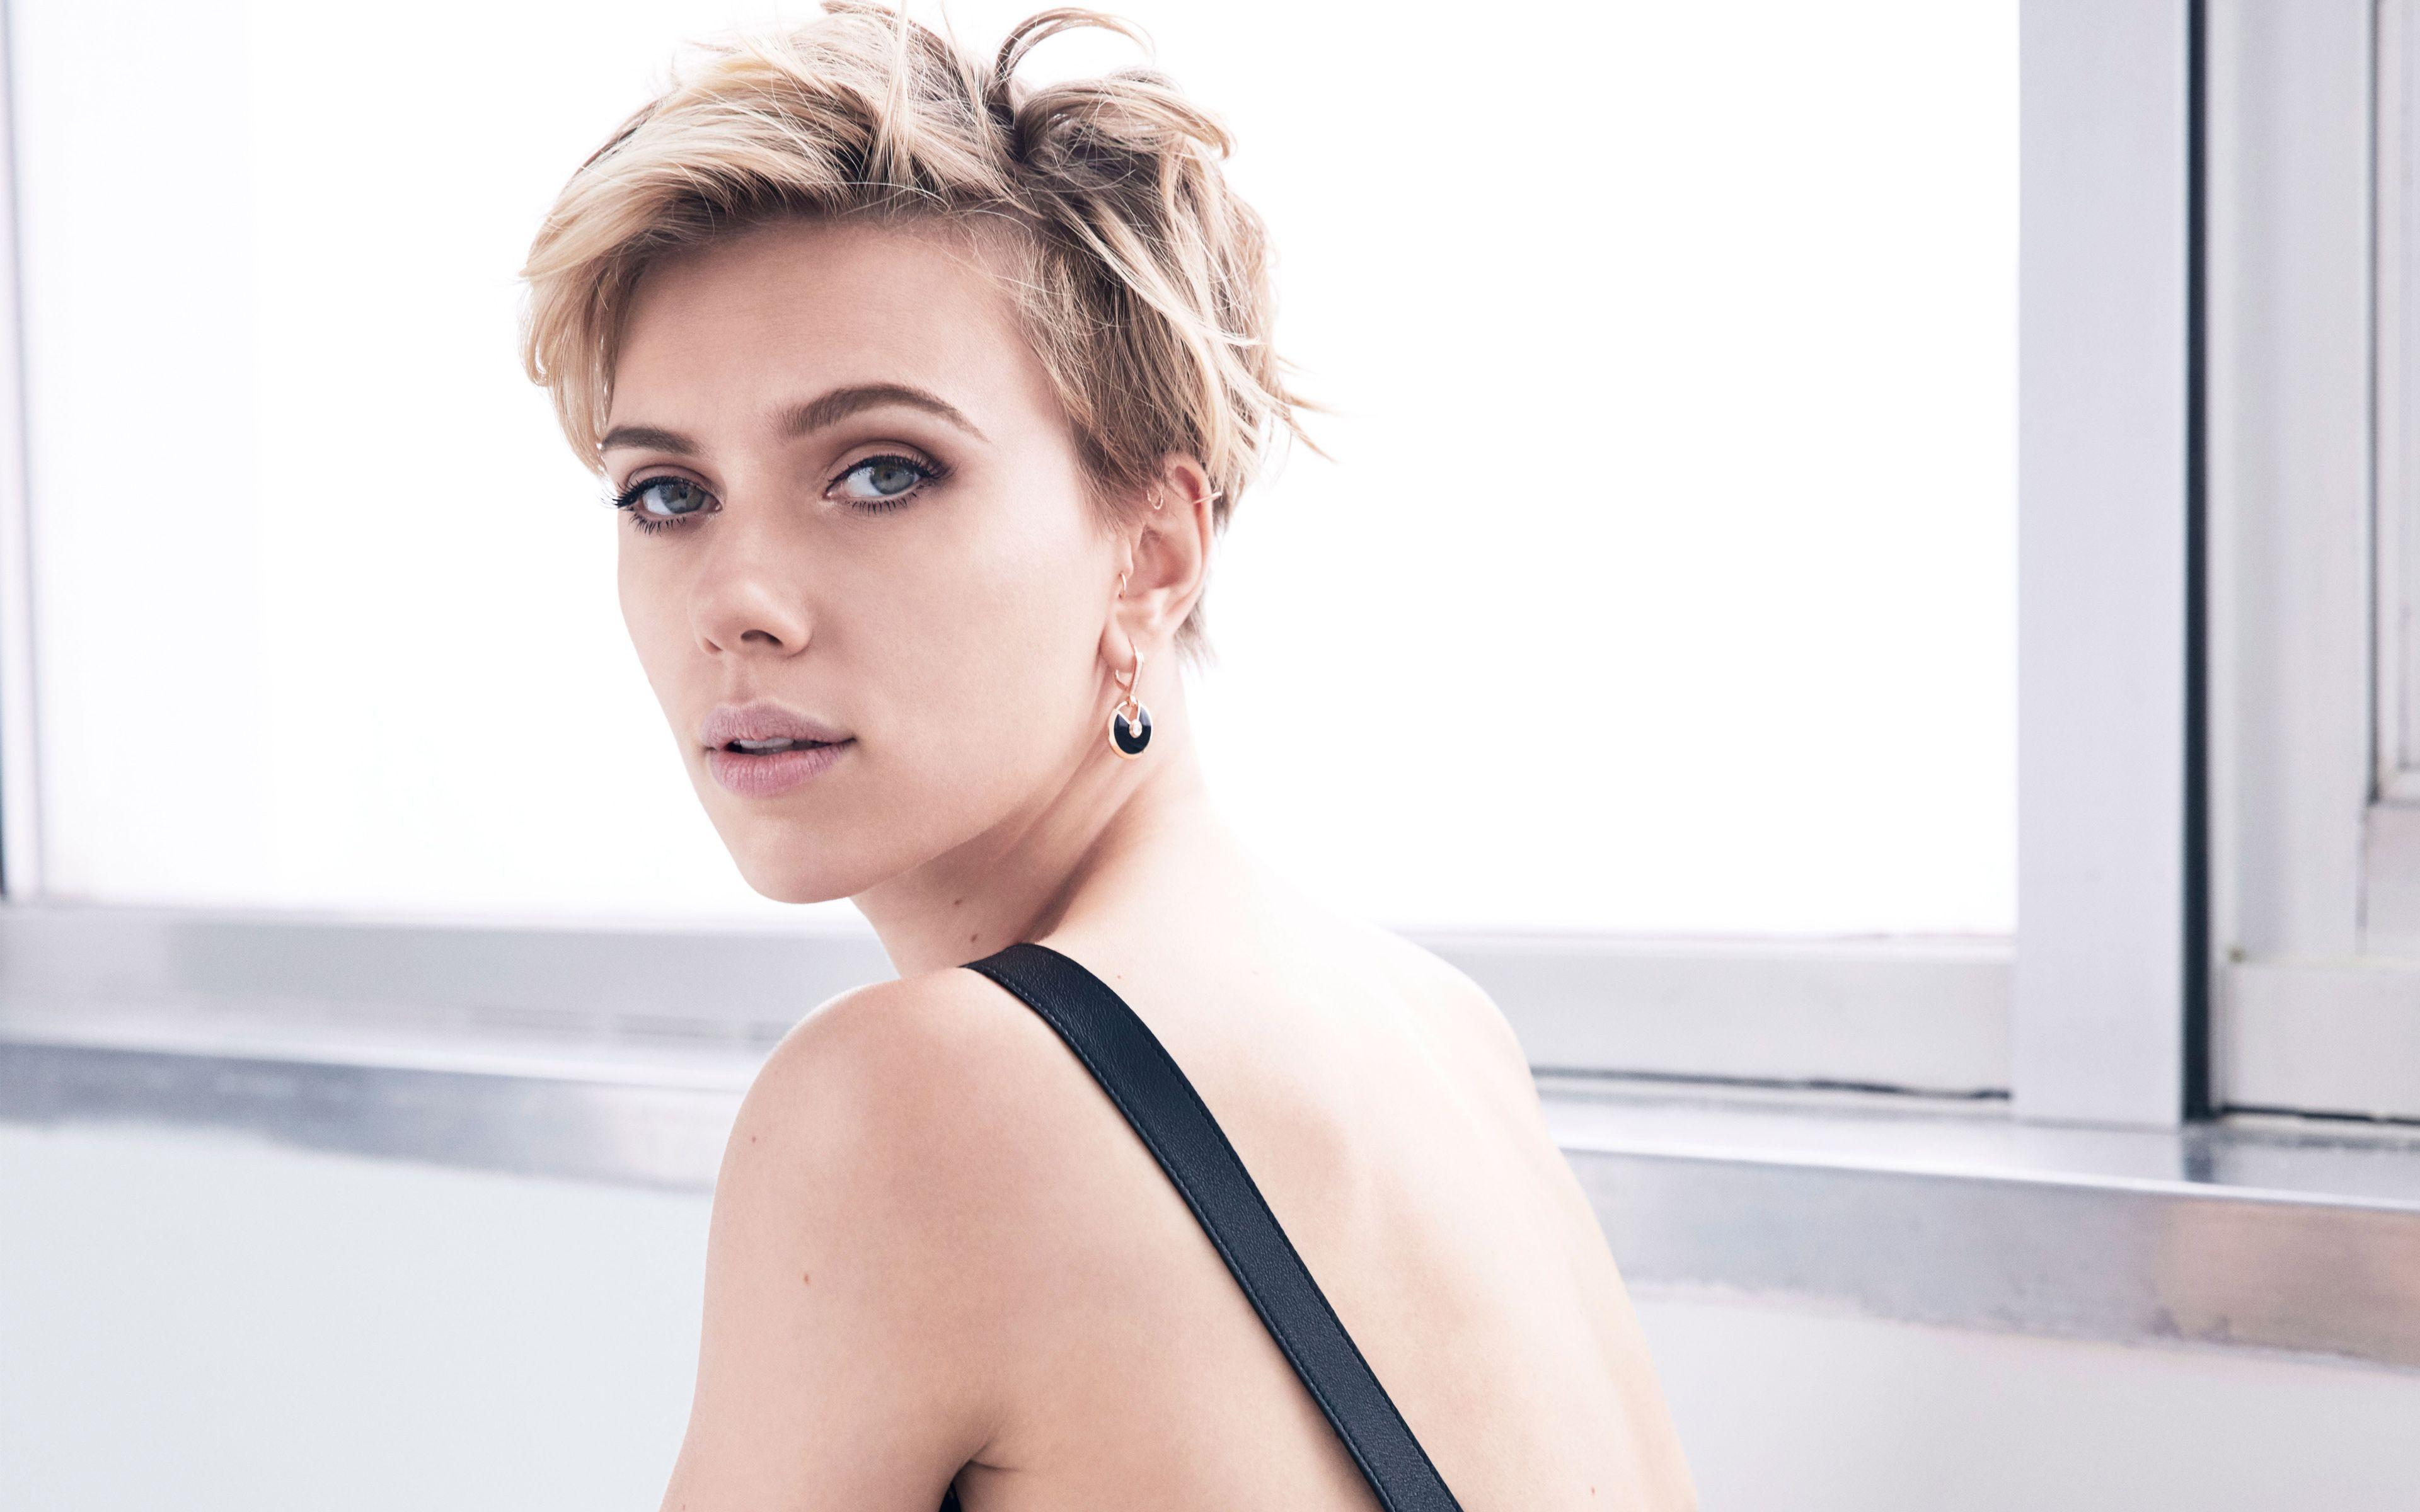 Scarlett Johansson 2019 Wallpapers Wallpaper Cave